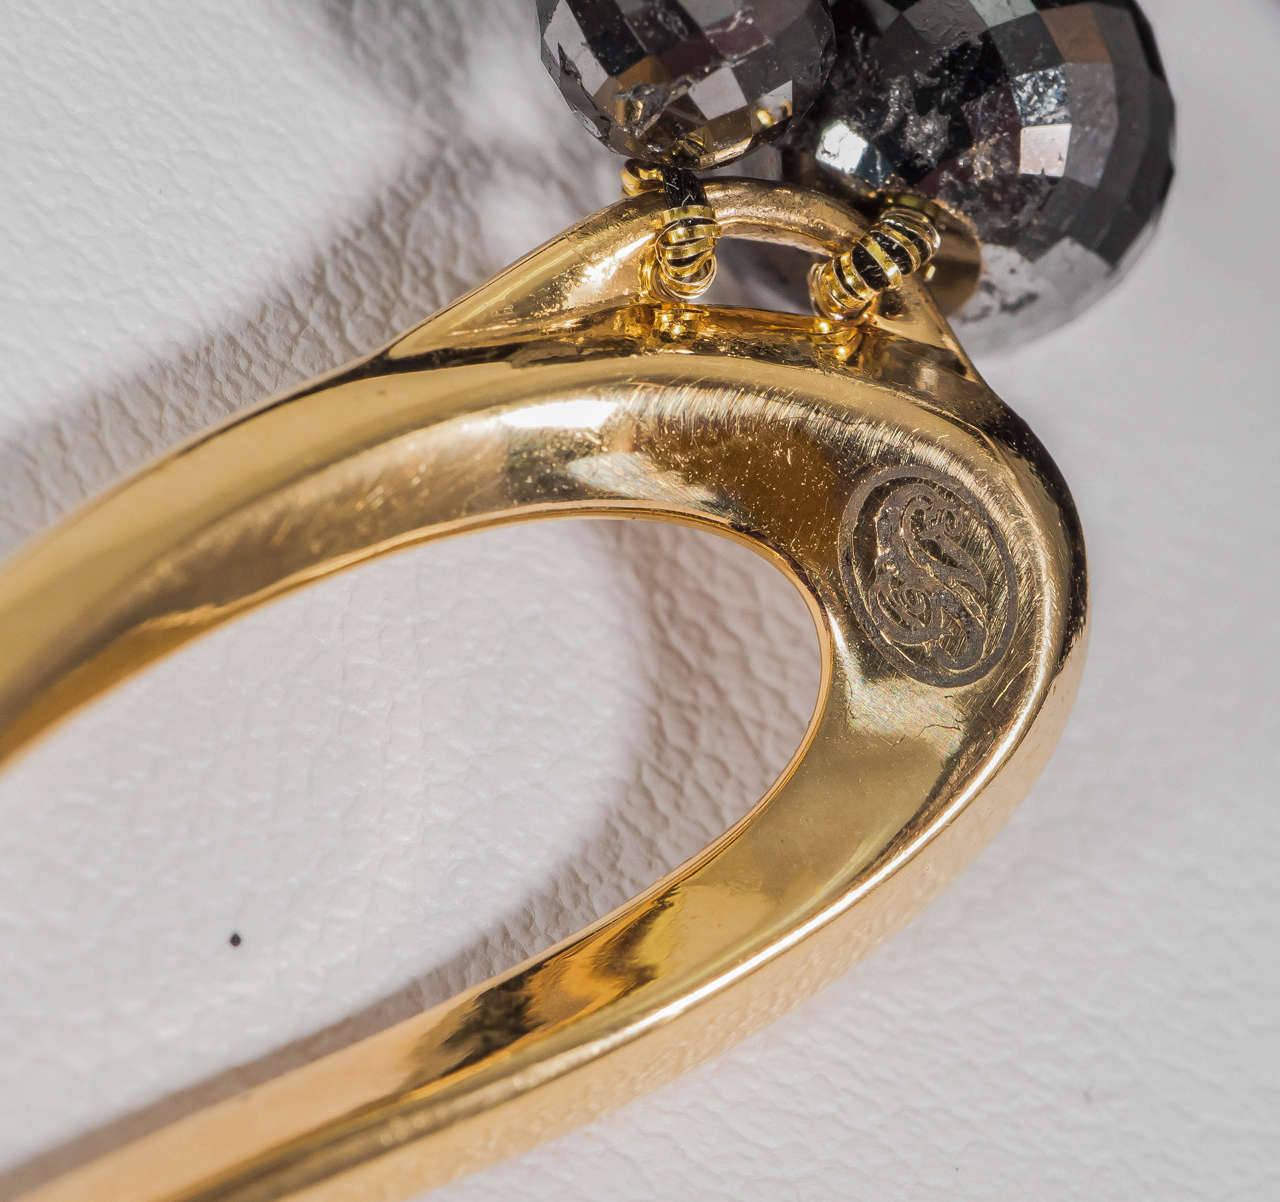 Naomi Sarna Black Diamond Necklace with 18K Gold and White Diamond Clasp For Sale 5